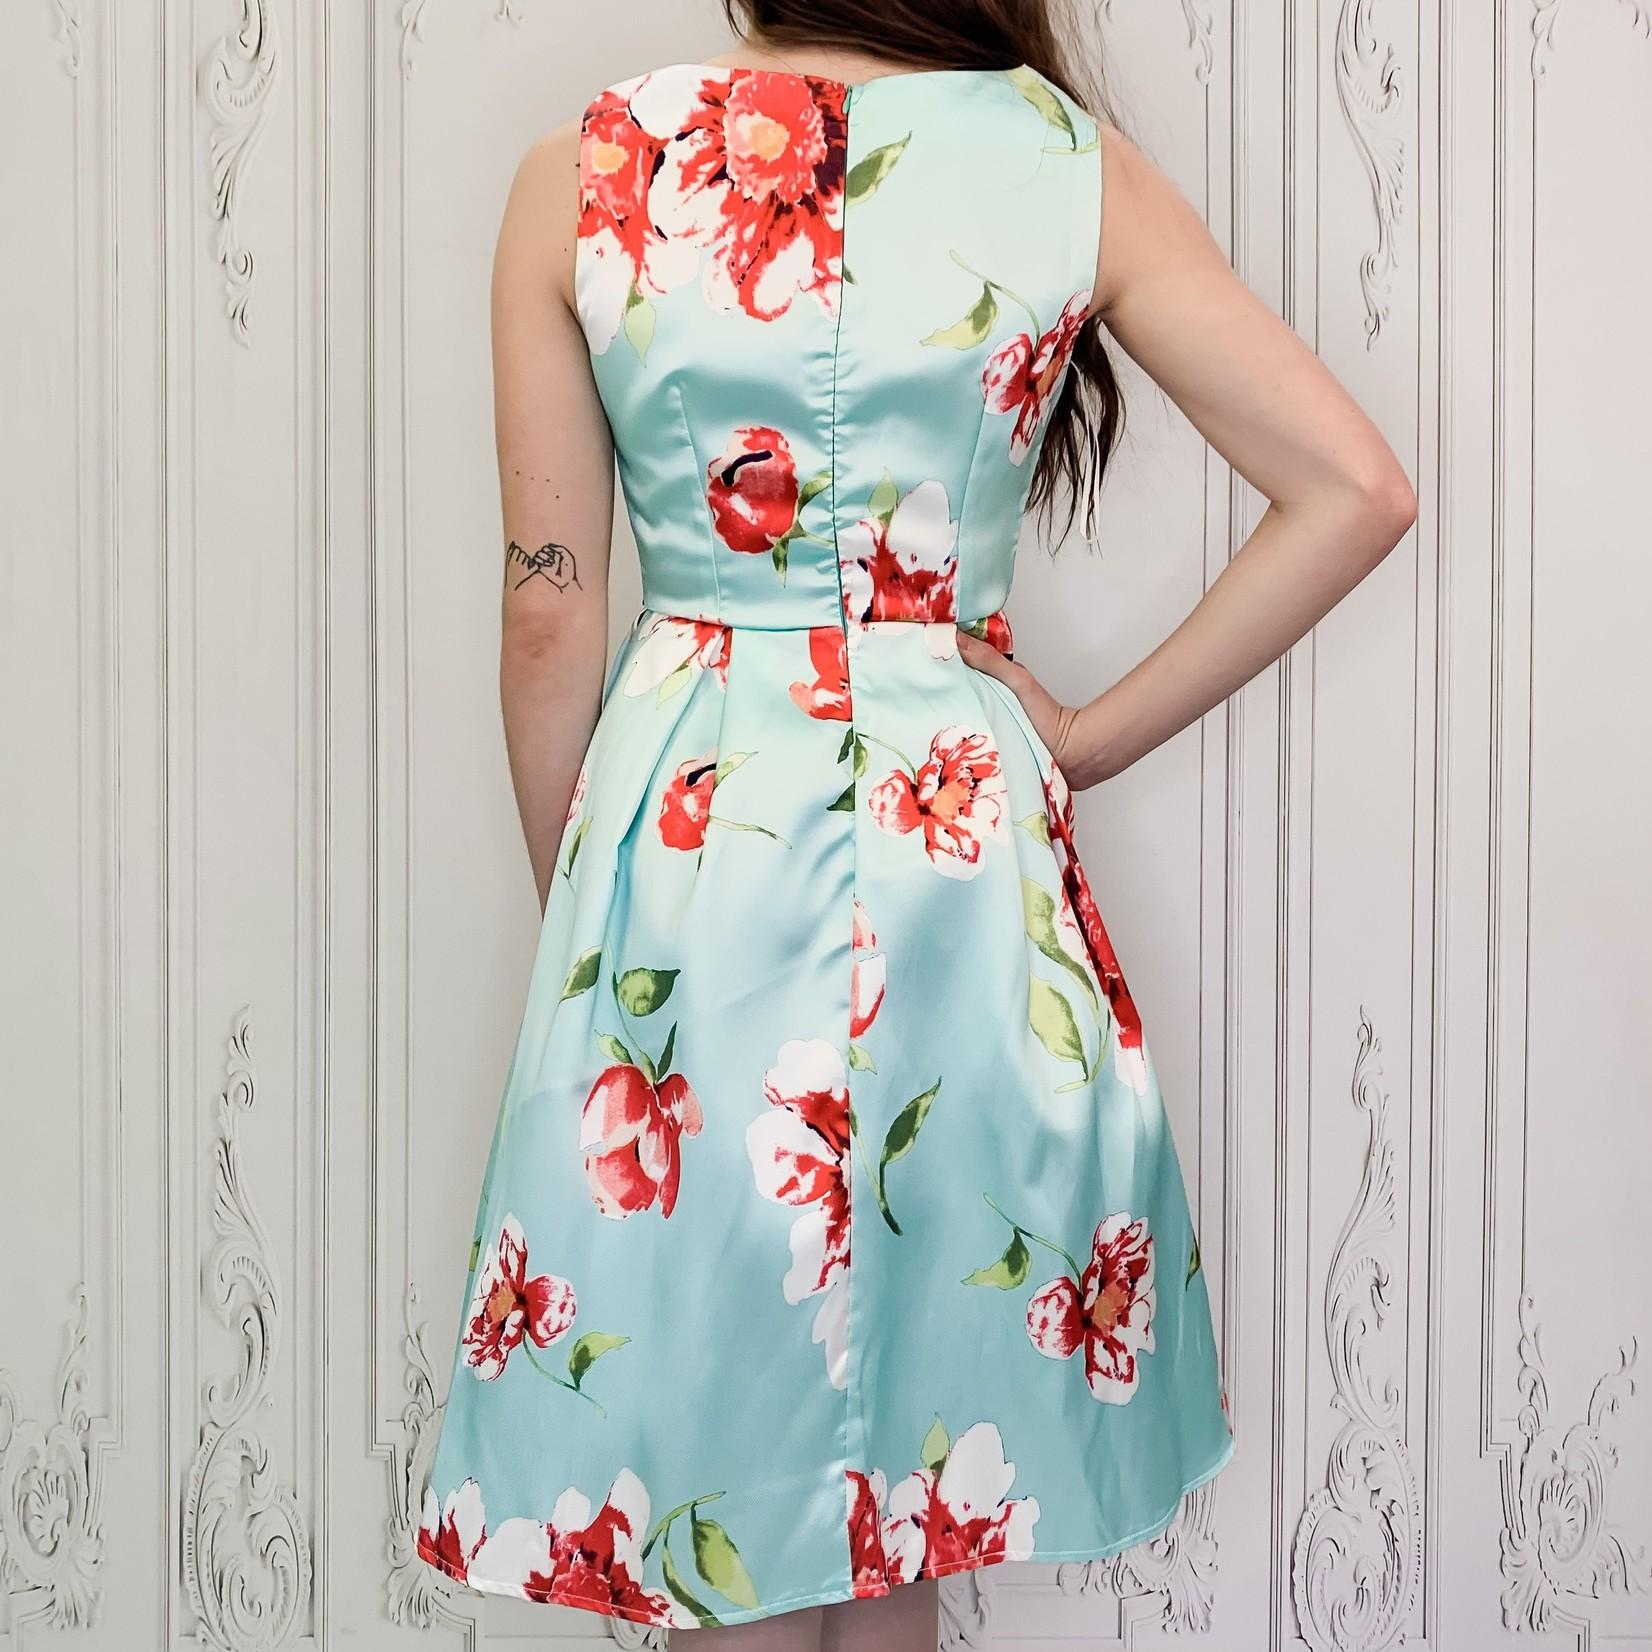 Amber structured floral dress